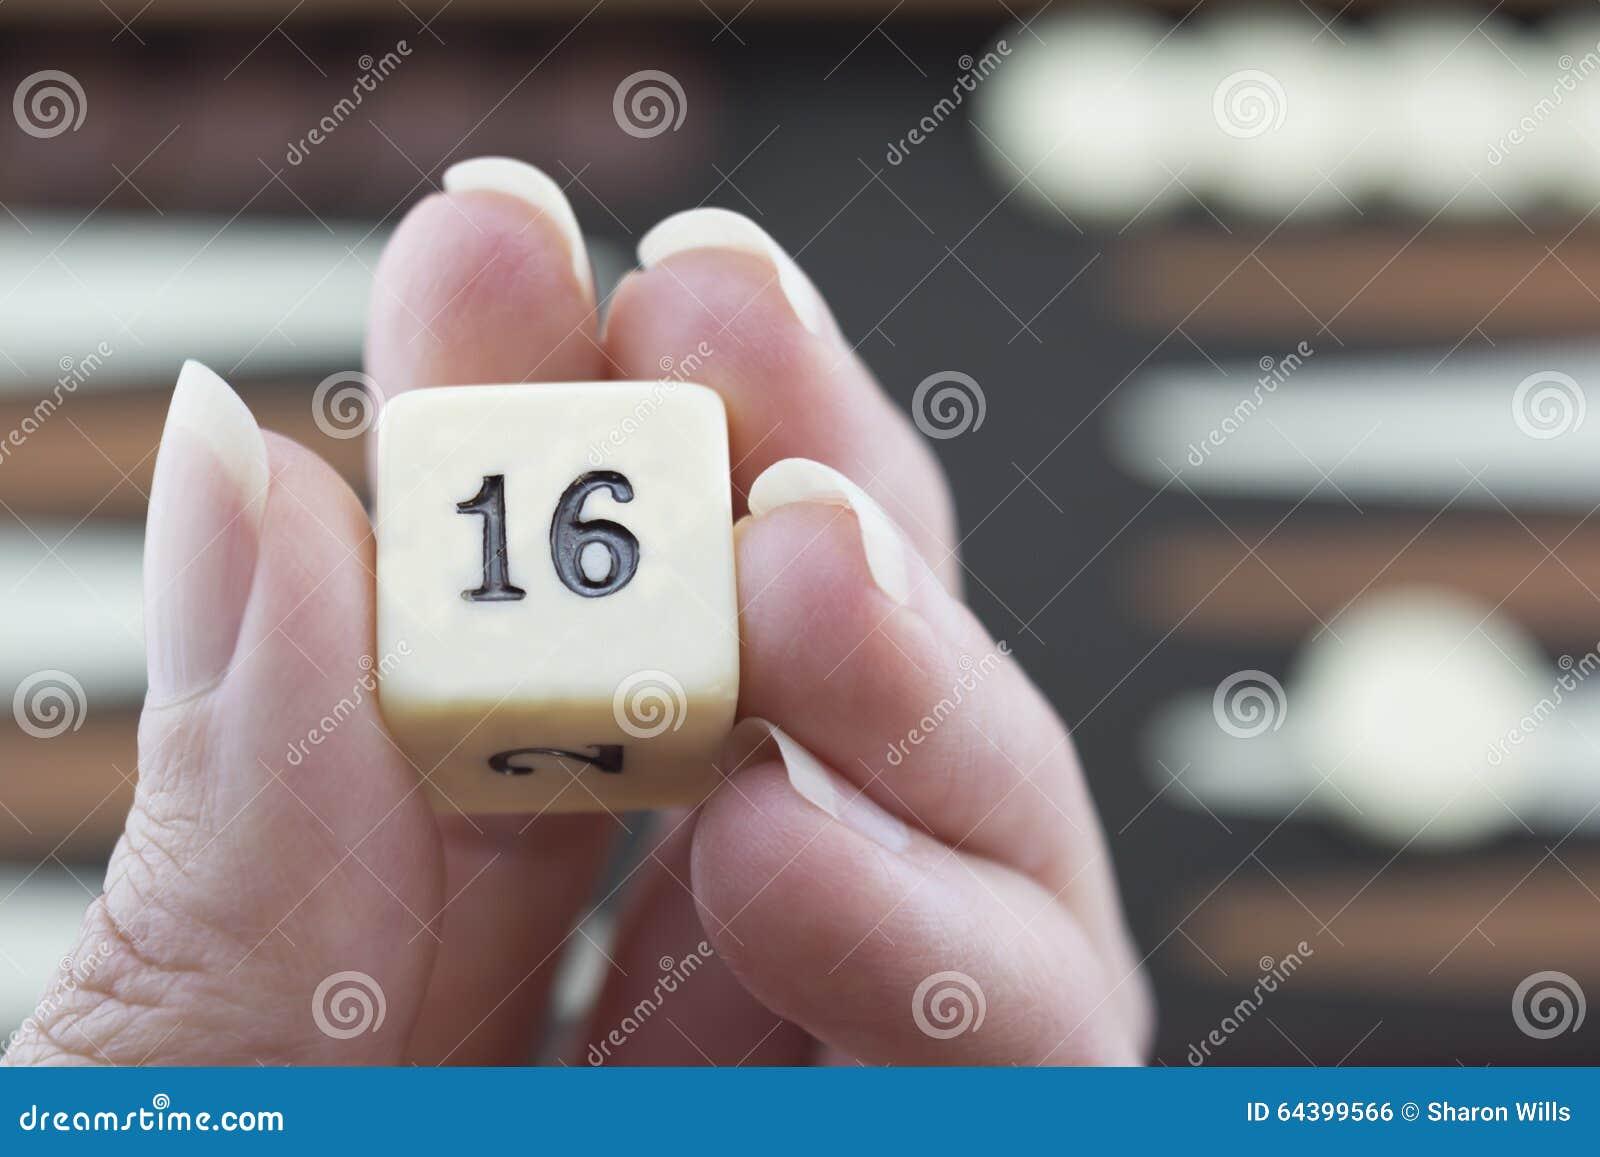 Speelspelenreeks - Rolling Backgammon dobbel - Nr 16